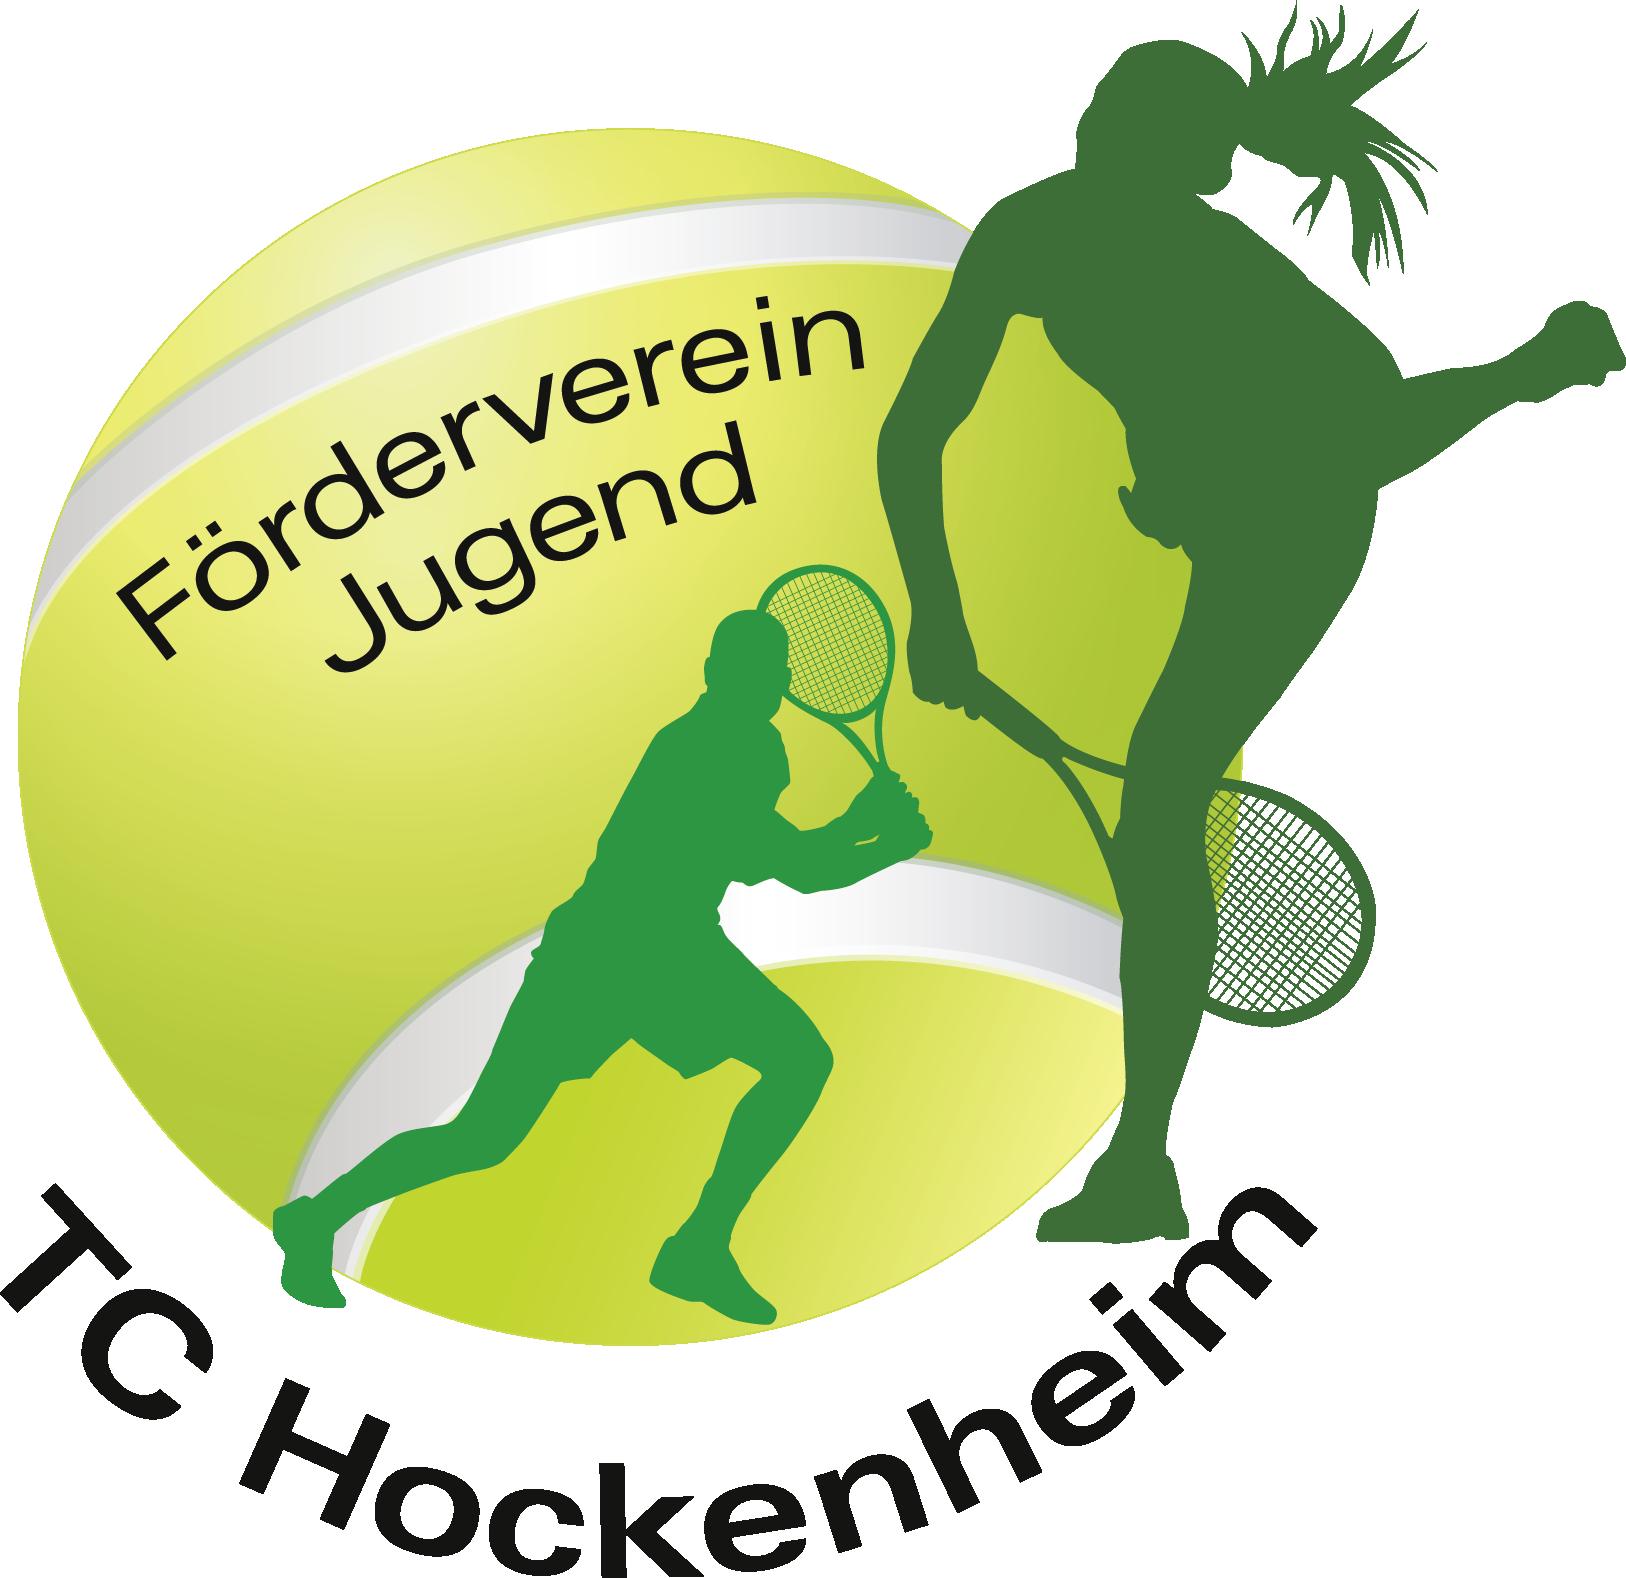 TC-Hockenheim_Förderverein_Jugend_RGB